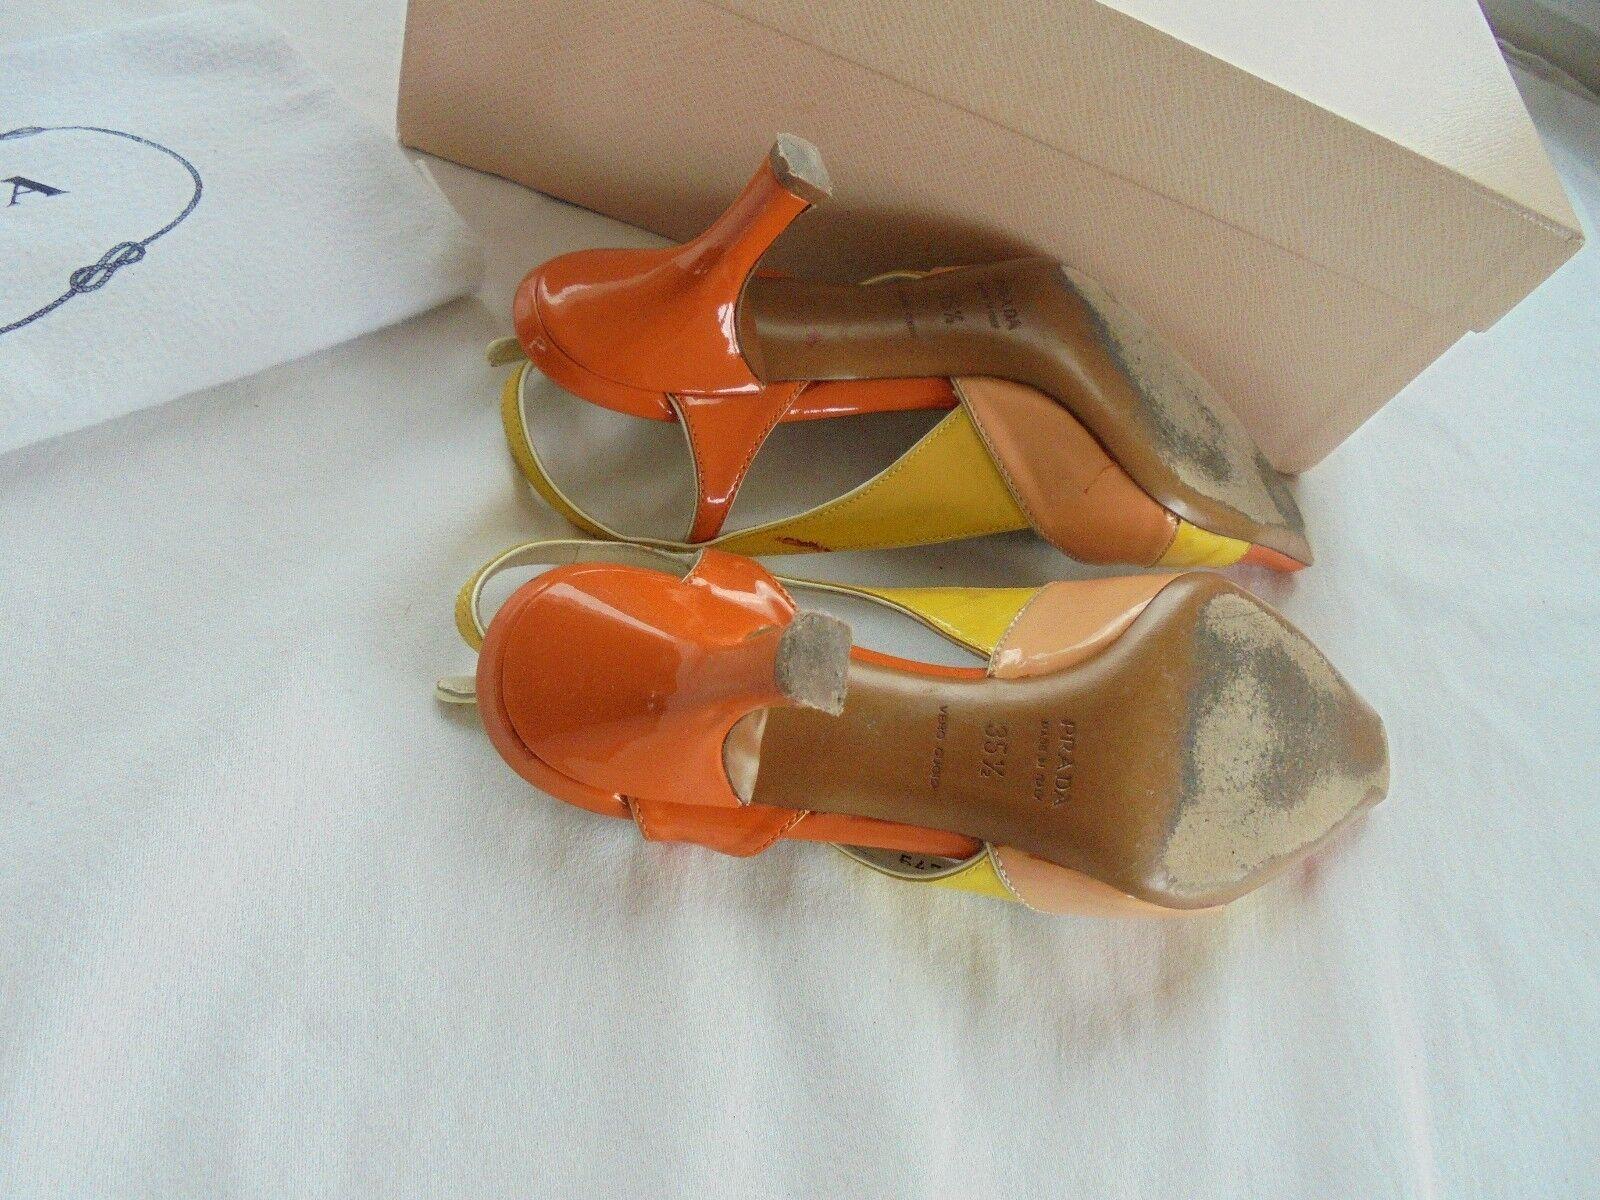 Sehr schöne Prada Lackleder Nude Schuhe Pumps NP  Sandalen Schuhe Nude Gr. 35 35,5 36 a35db2